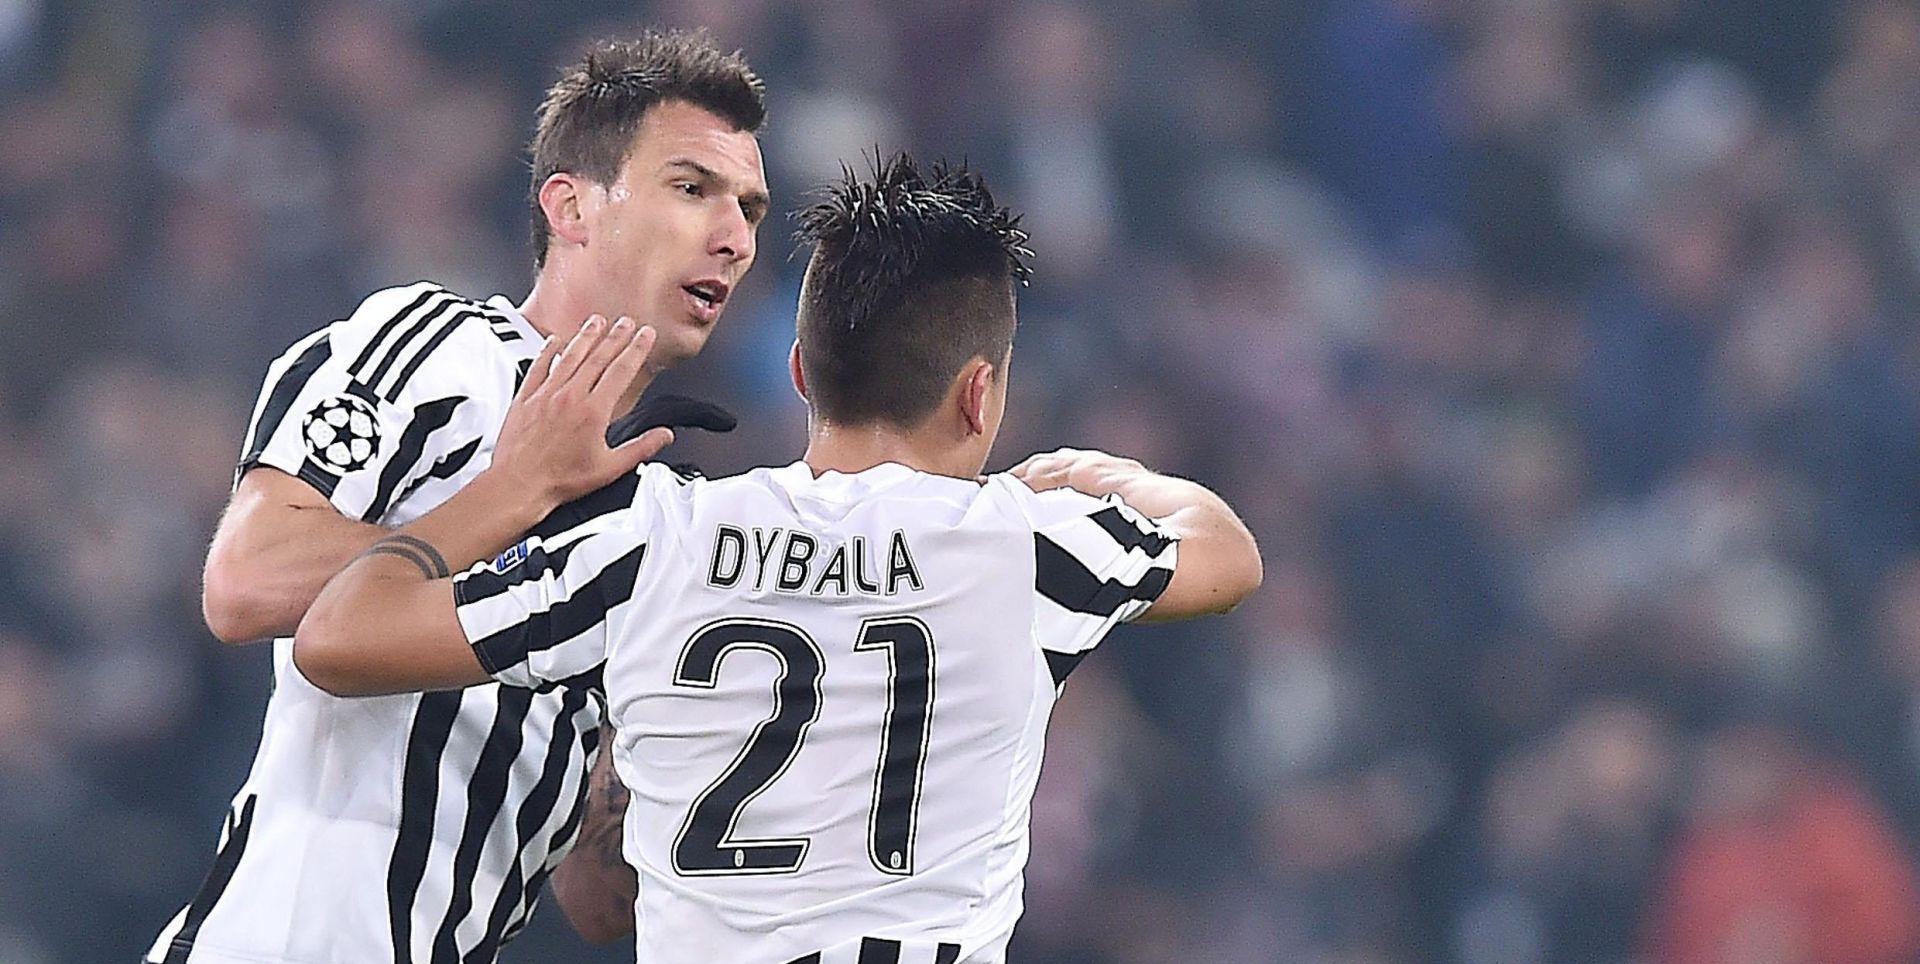 SERIE A Juventus preokrenuo preko Dybale, dva pogotka Džeke u slavlju Rome